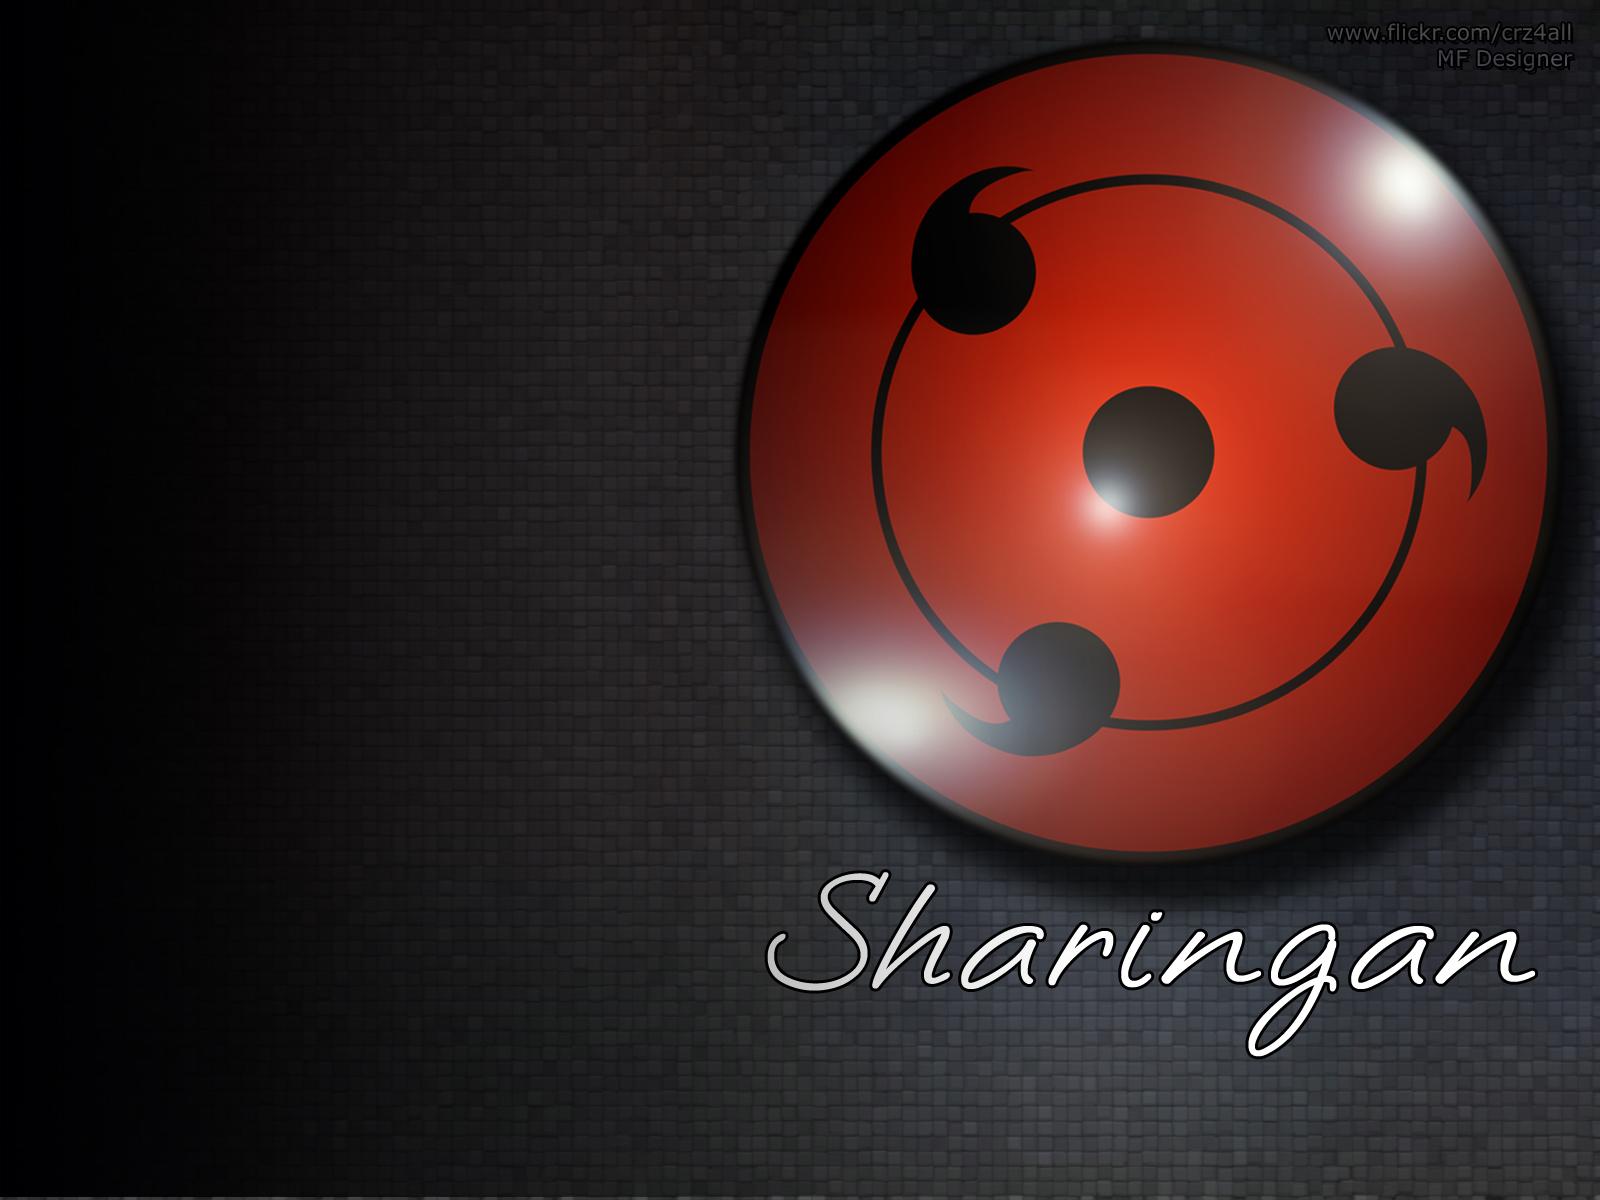 Naruto Shippuden Wallpaper Hd 1080p Mangekyou Sharingan Wallpapers Hd Pixelstalk Net